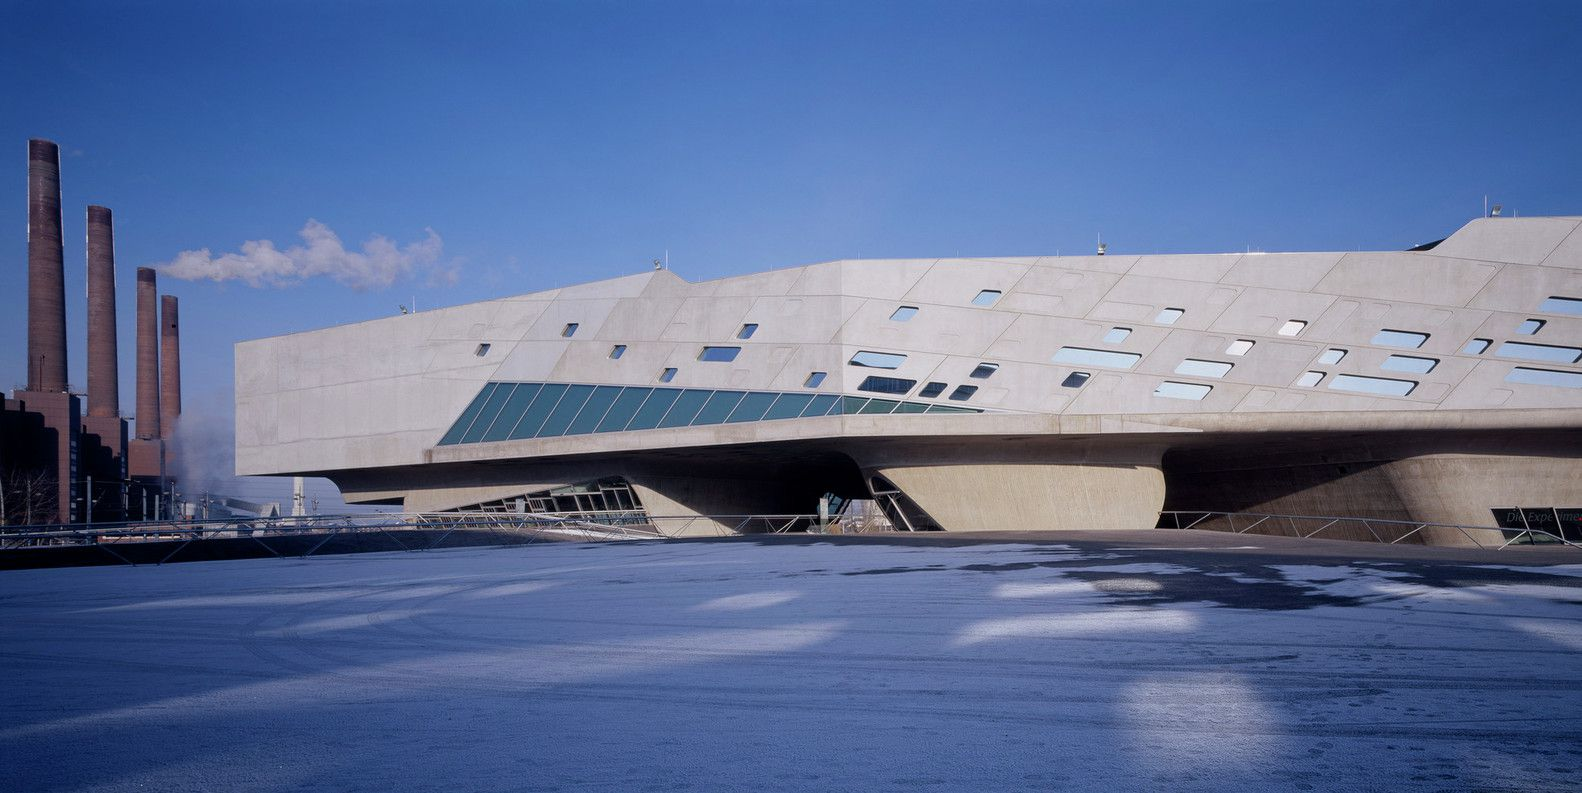 Phaeno Science Center in Wolfsburg, Germany, 2005 Photo by Werner Huthmacher via ArchDaily